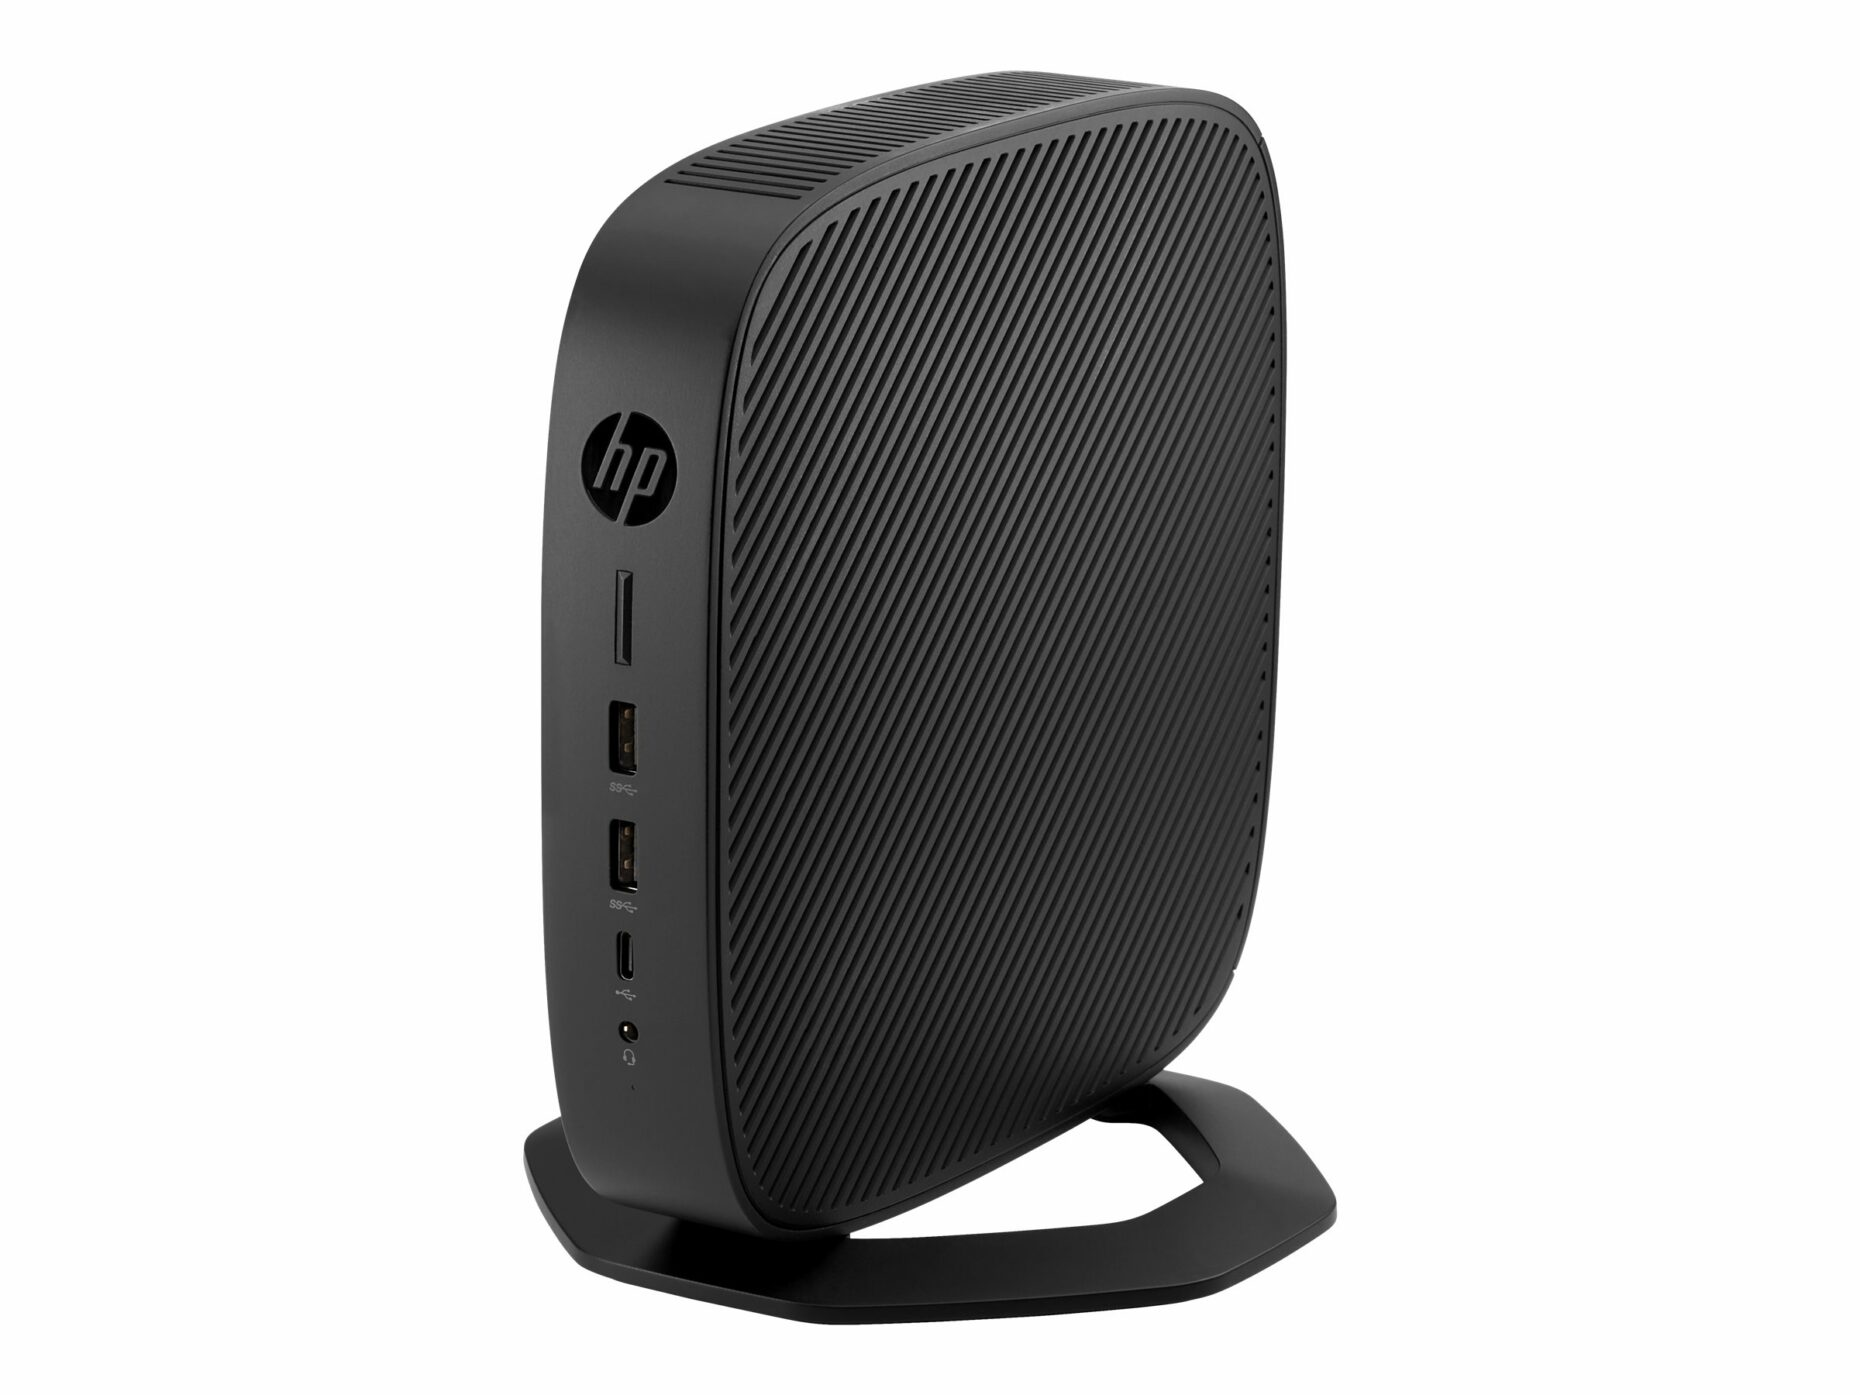 HP t640 - Smart Buy - Ryzen Embedded R1505G / 2.4 GHz - RAM 8 GB - flash 64 GB - Radeon Vega 3 - Thin Client Desktop